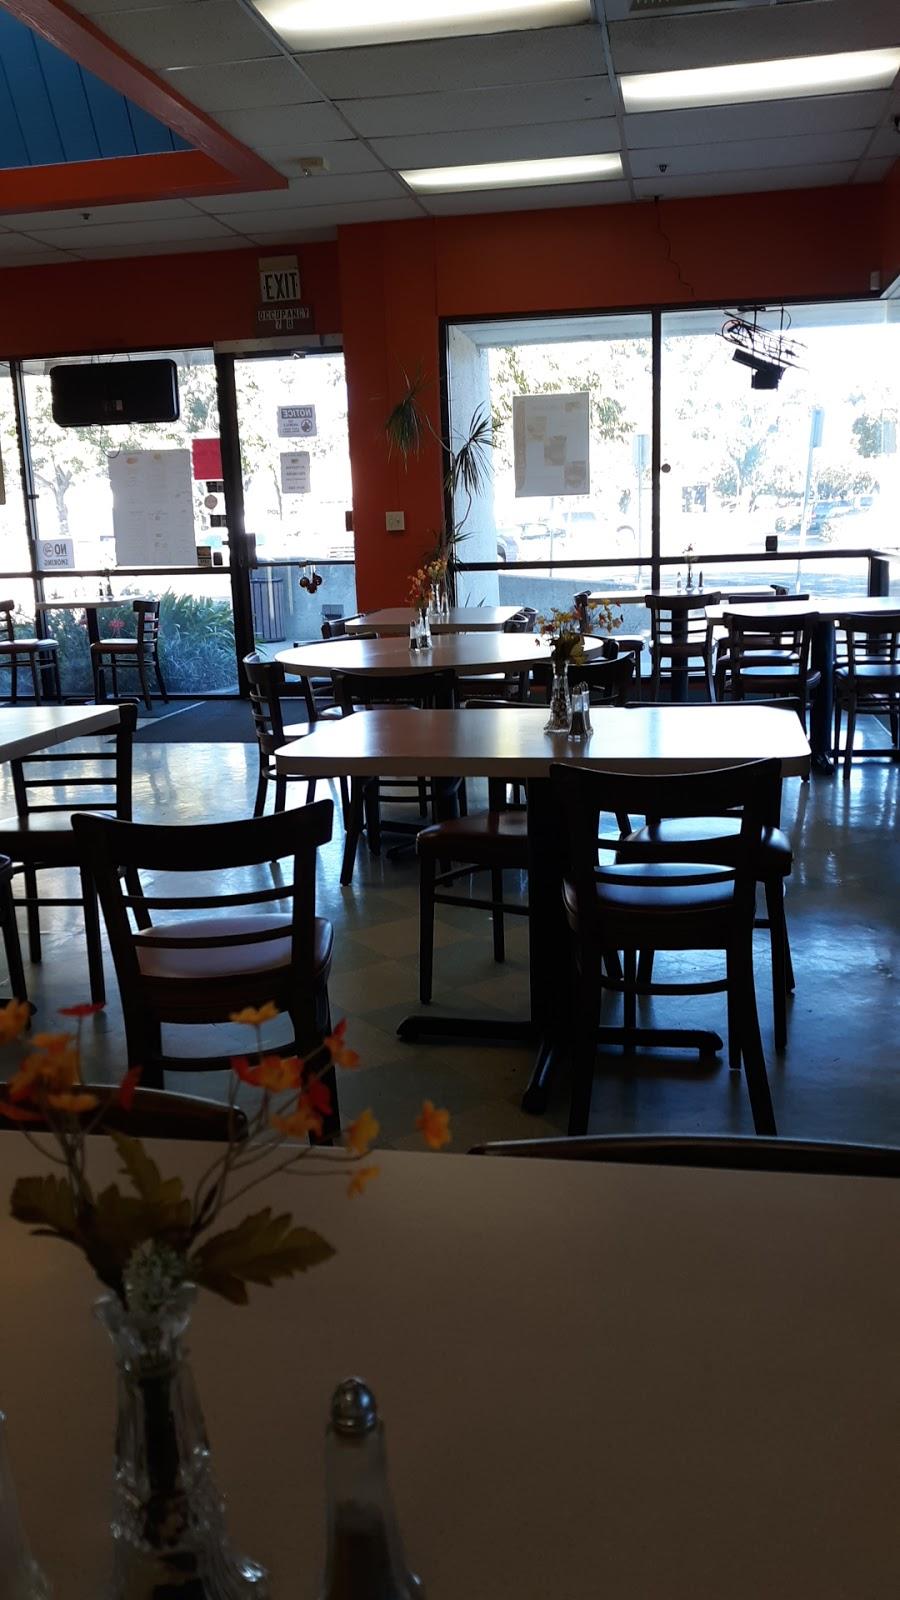 Hot Spot Café & Deli - cafe  | Photo 6 of 10 | Address: 800 Chadbourne Rd #11, Fairfield, CA 94534, USA | Phone: (707) 421-0296